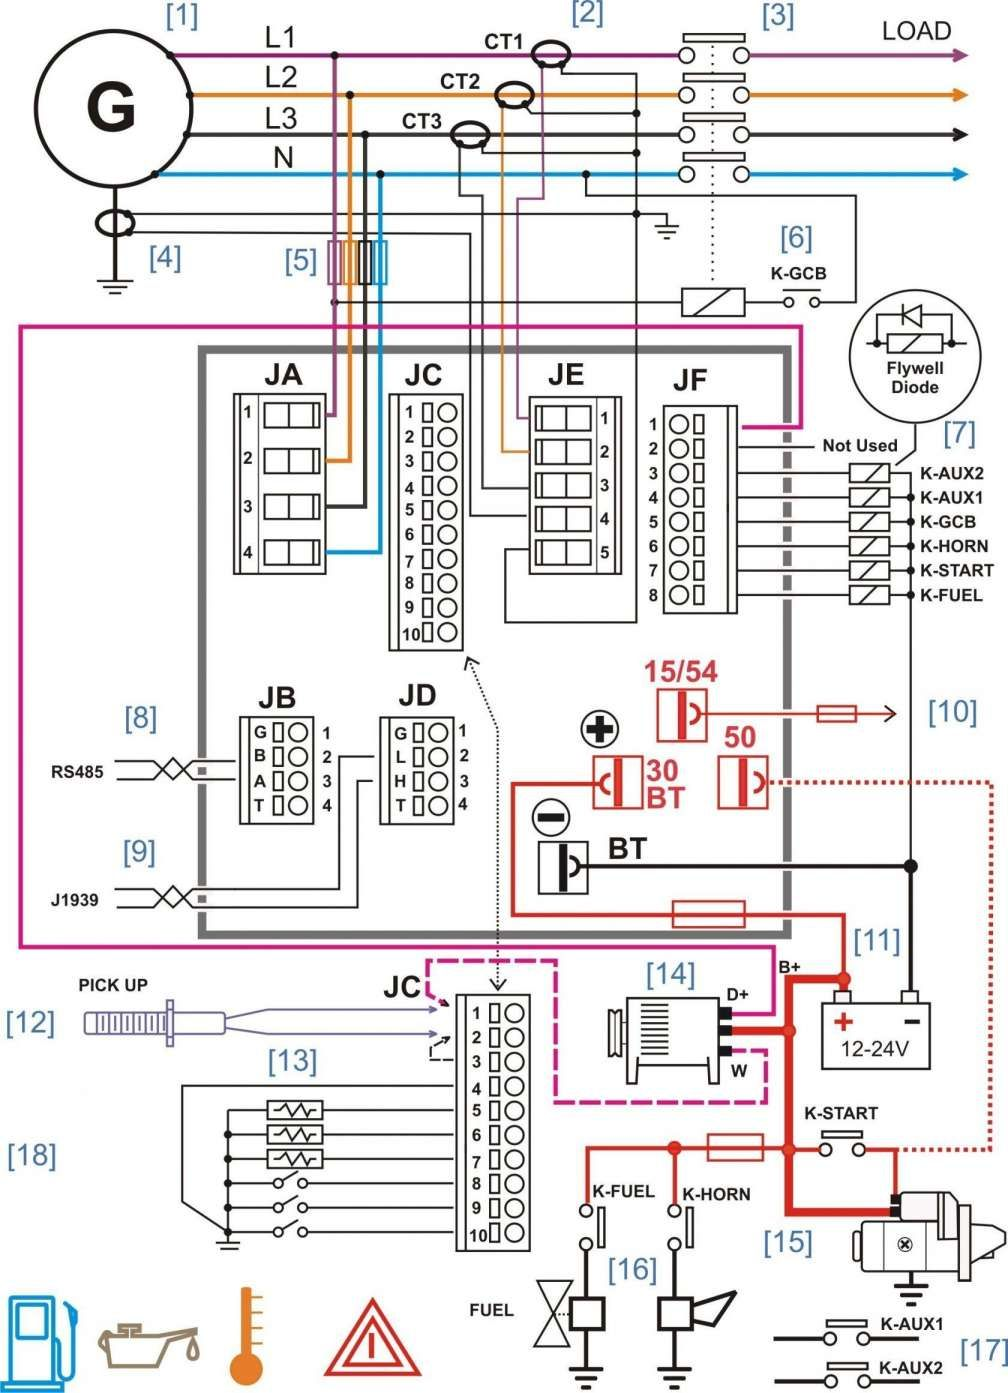 17 Blaupunkt Car Radio Stereo Audio Wiring Diagram Teknik Listrik Listrik Diagram